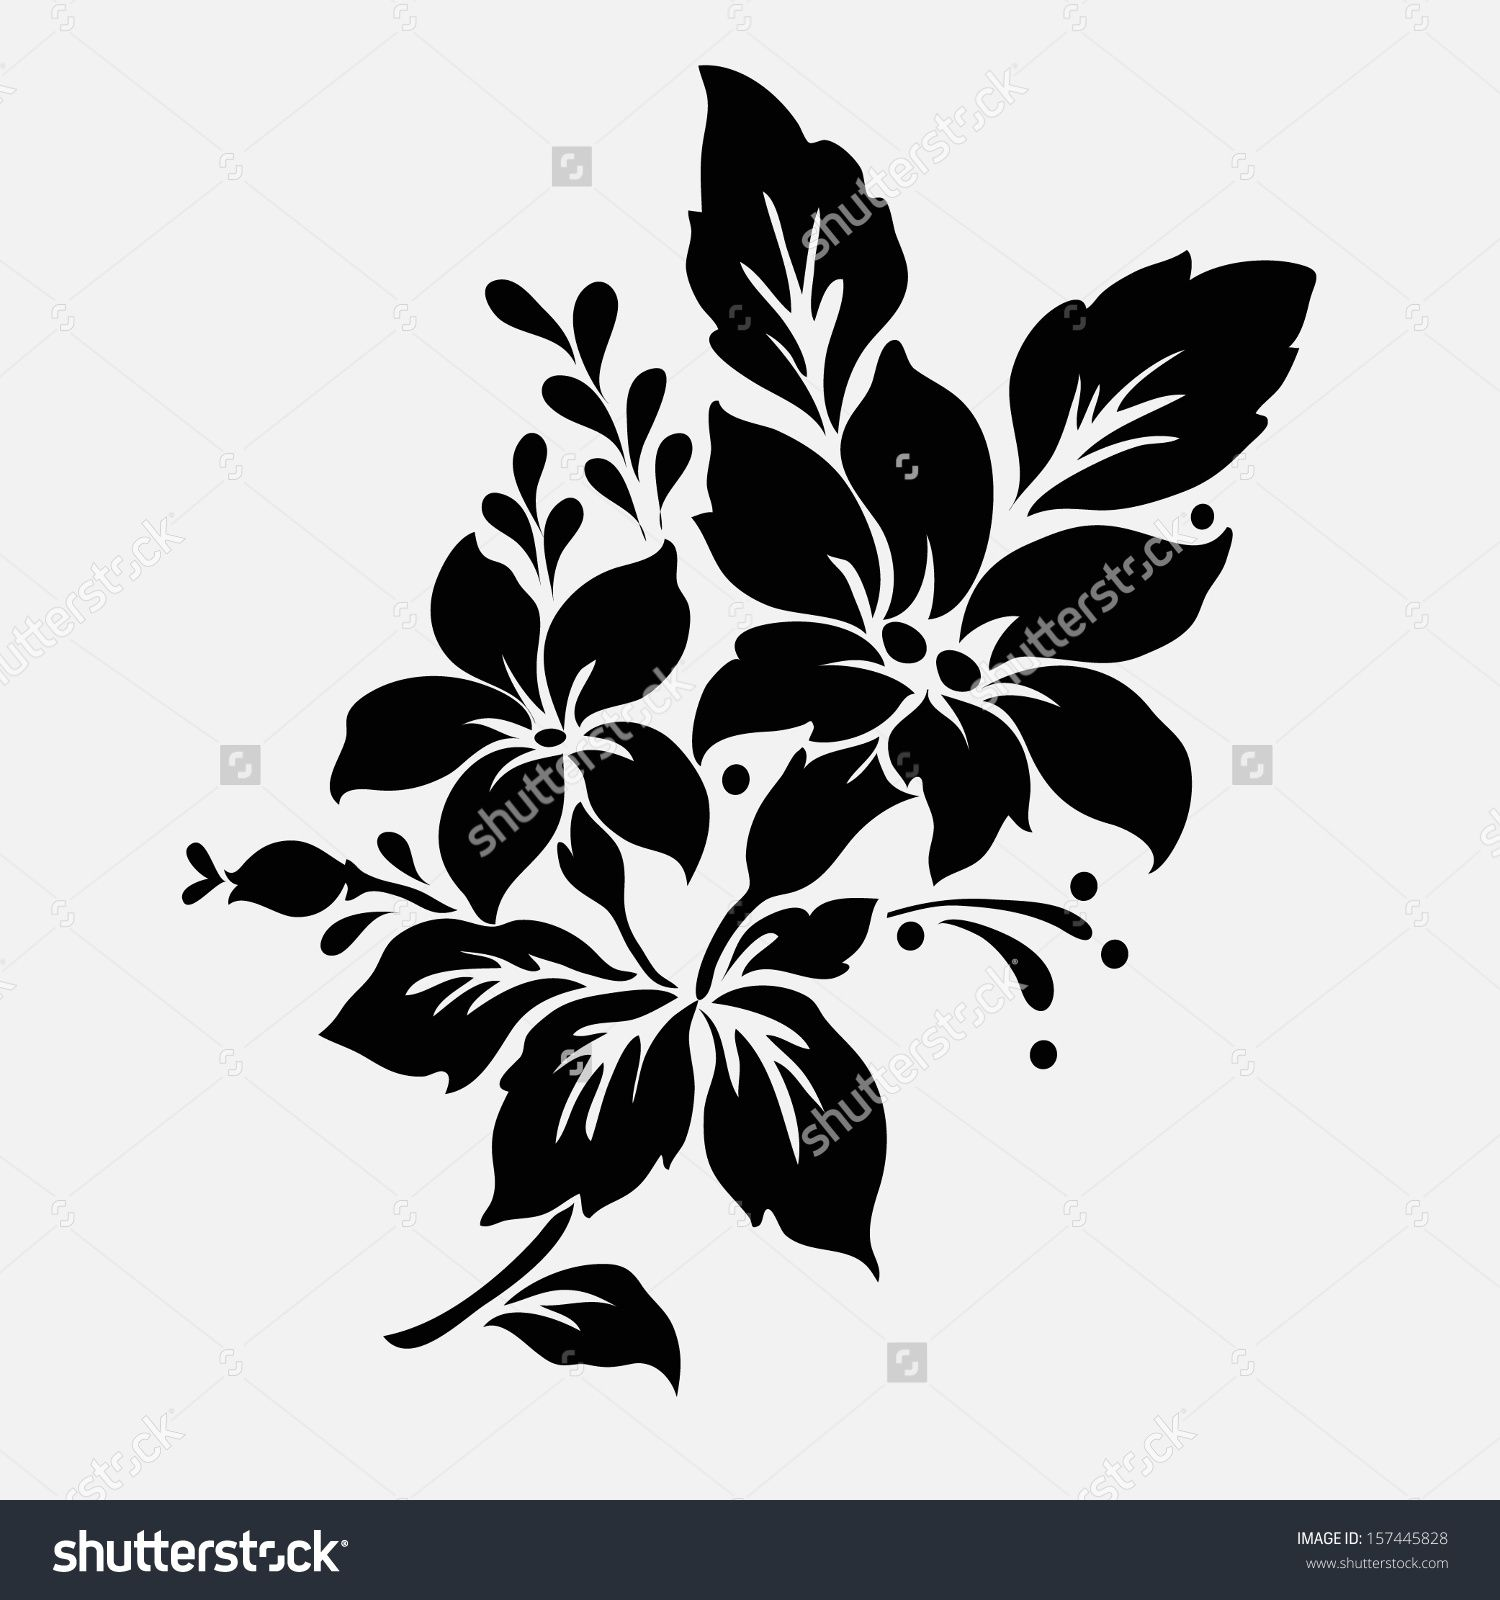 Line Art Flower Stencil Designs : Image result for flower vector pinterest